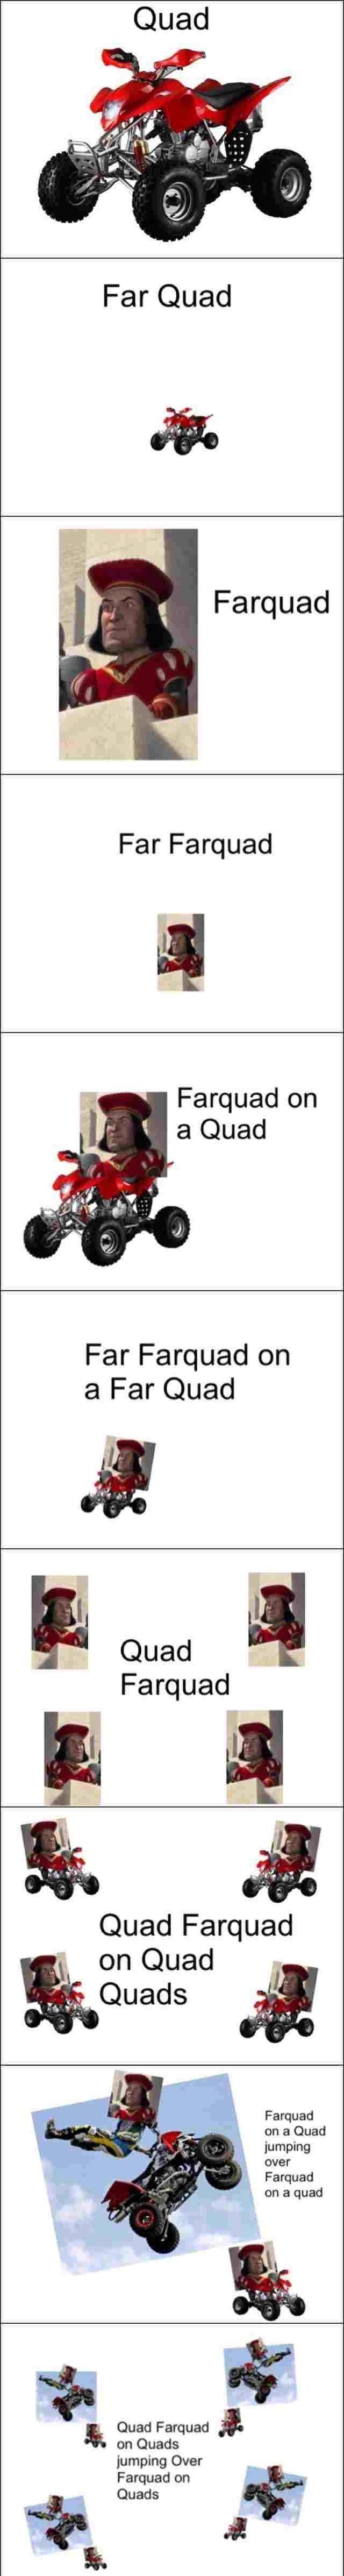 Quad Meme Lord Farquad is...